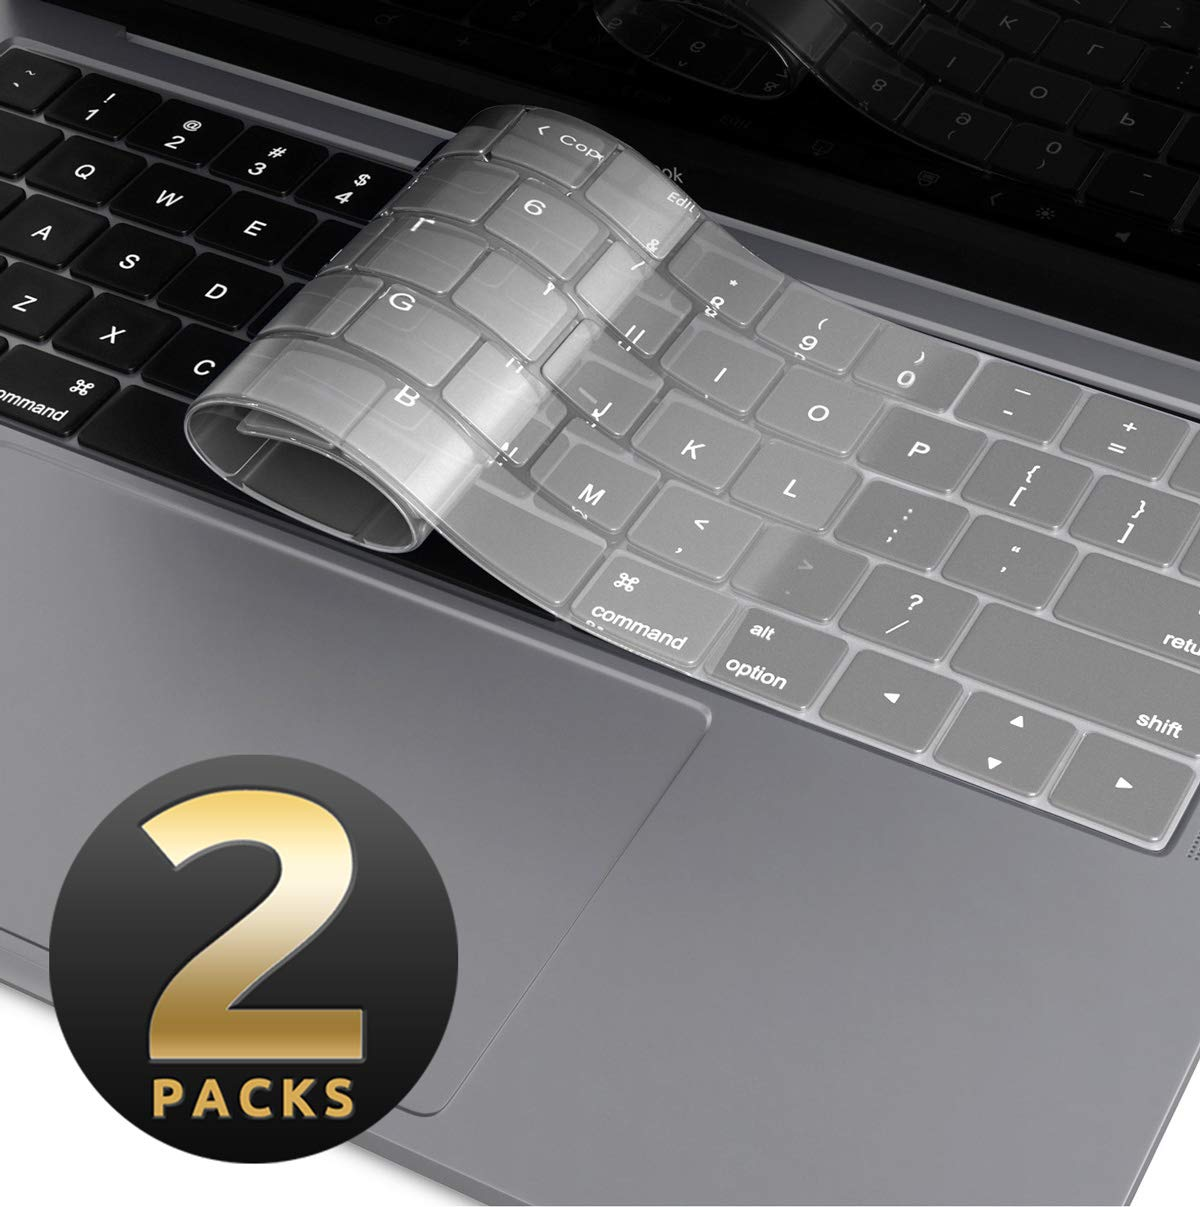 MacBook Air 13 Inch Keyboard Cover [2-Pack], i-Blason Clear Ultra Slim Silicone Keyboard Skin Protector for Apple MacBook Air 13 Inch 2018 Release A1932 ...